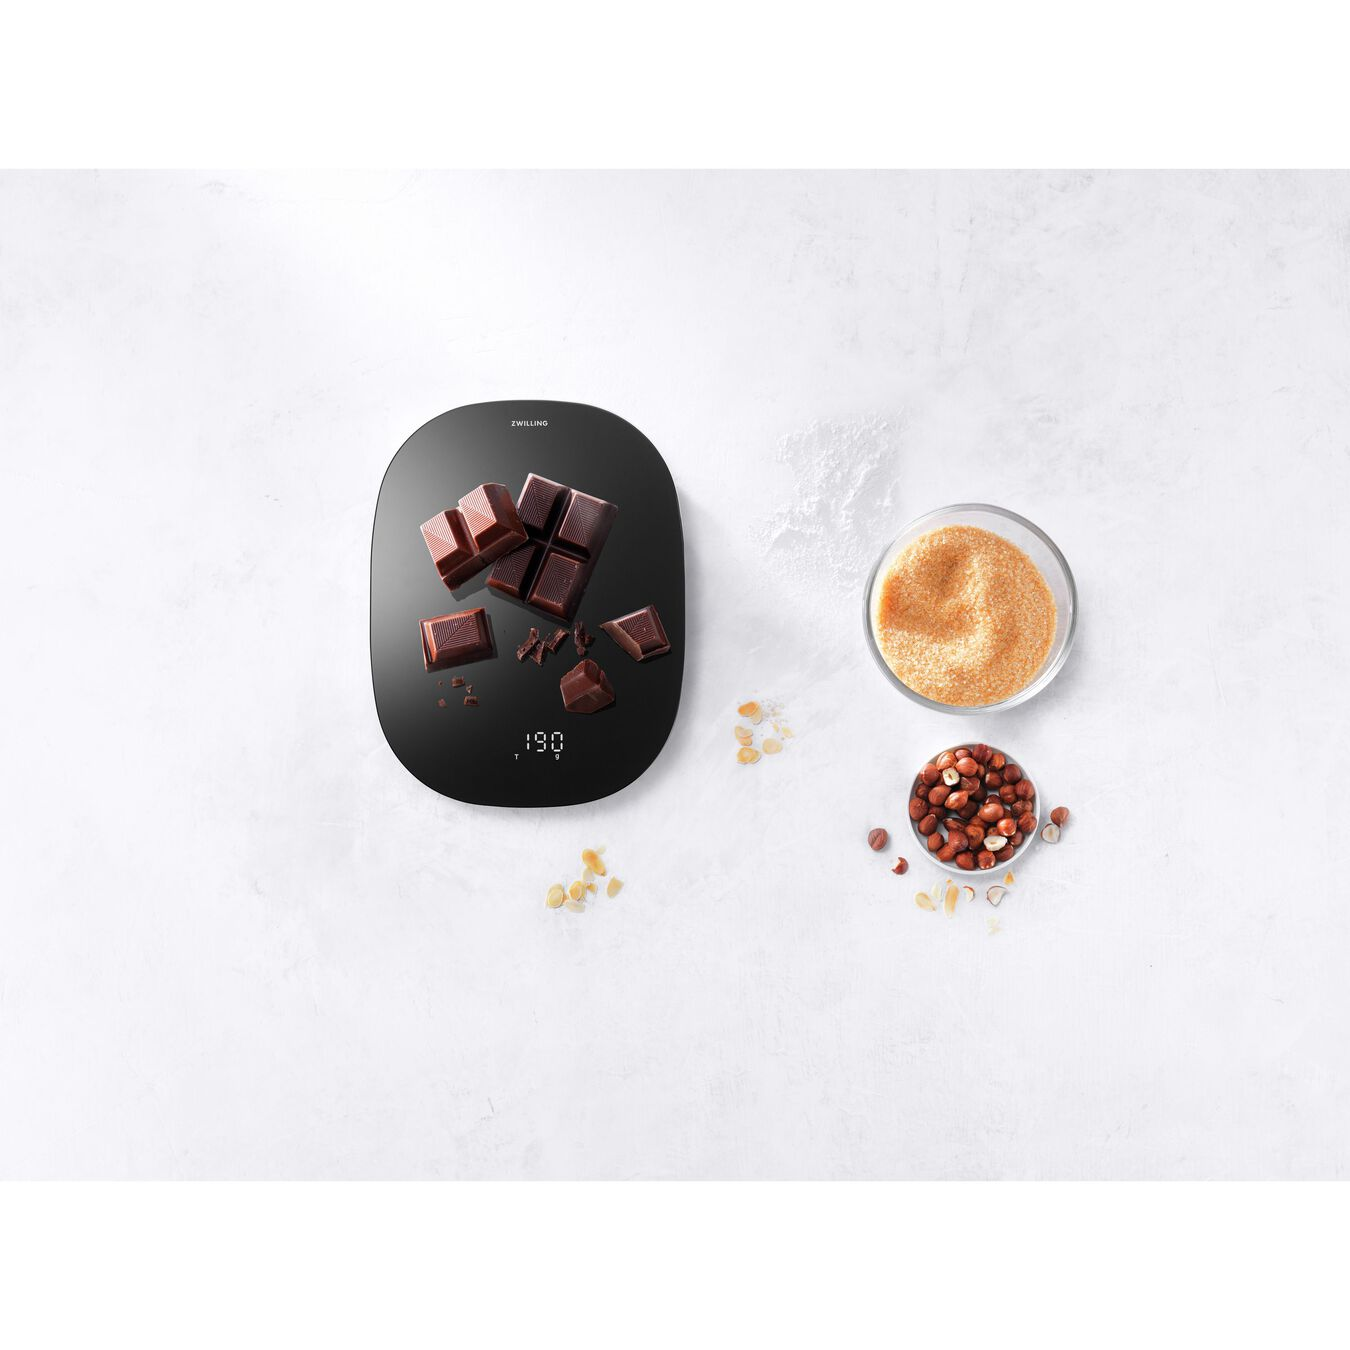 Digital Kitchen Scale - Black,,large 2